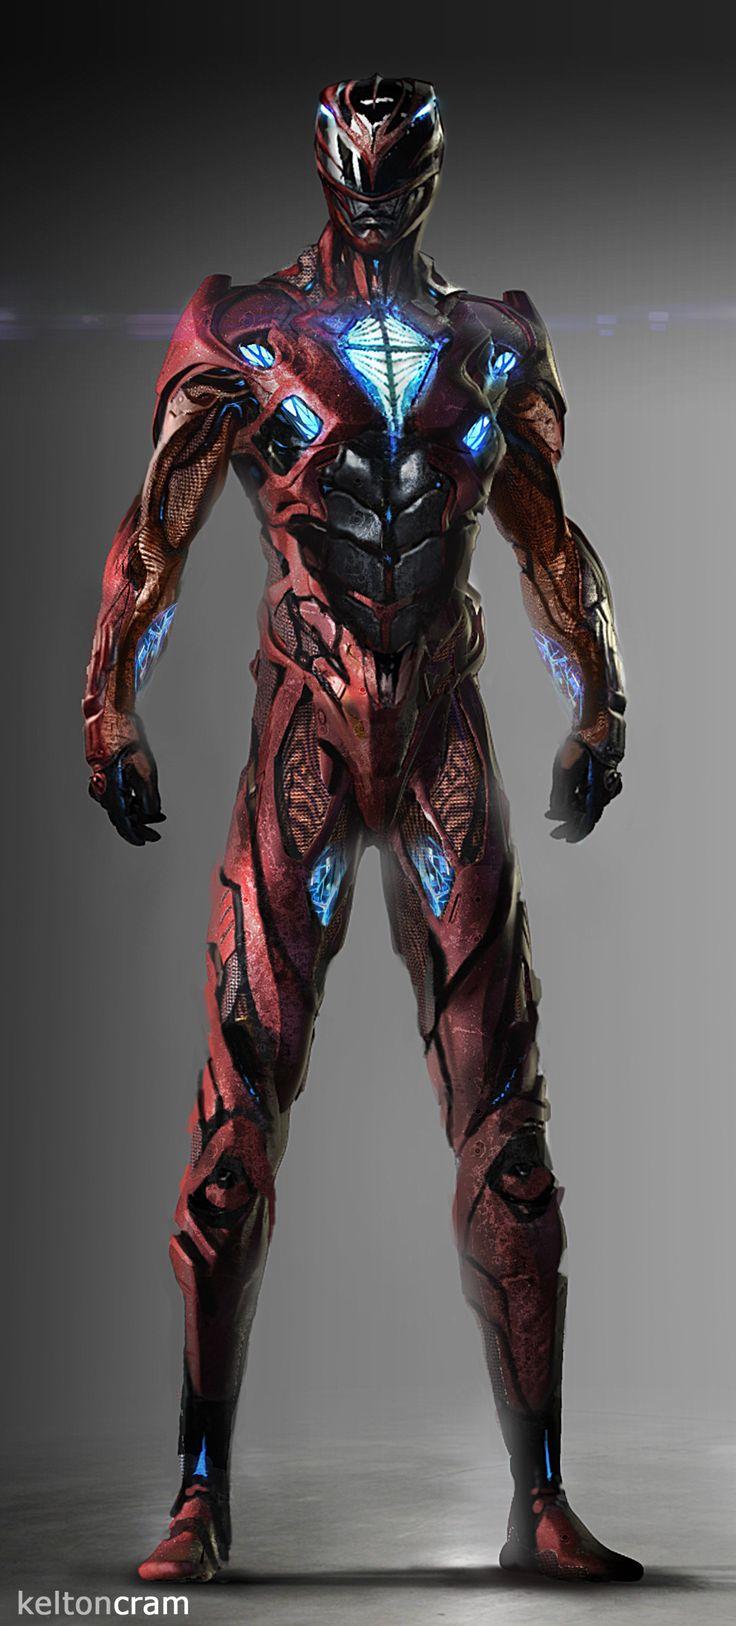 ArtStation - Power Rangers Alien Suit, Kelton Cram